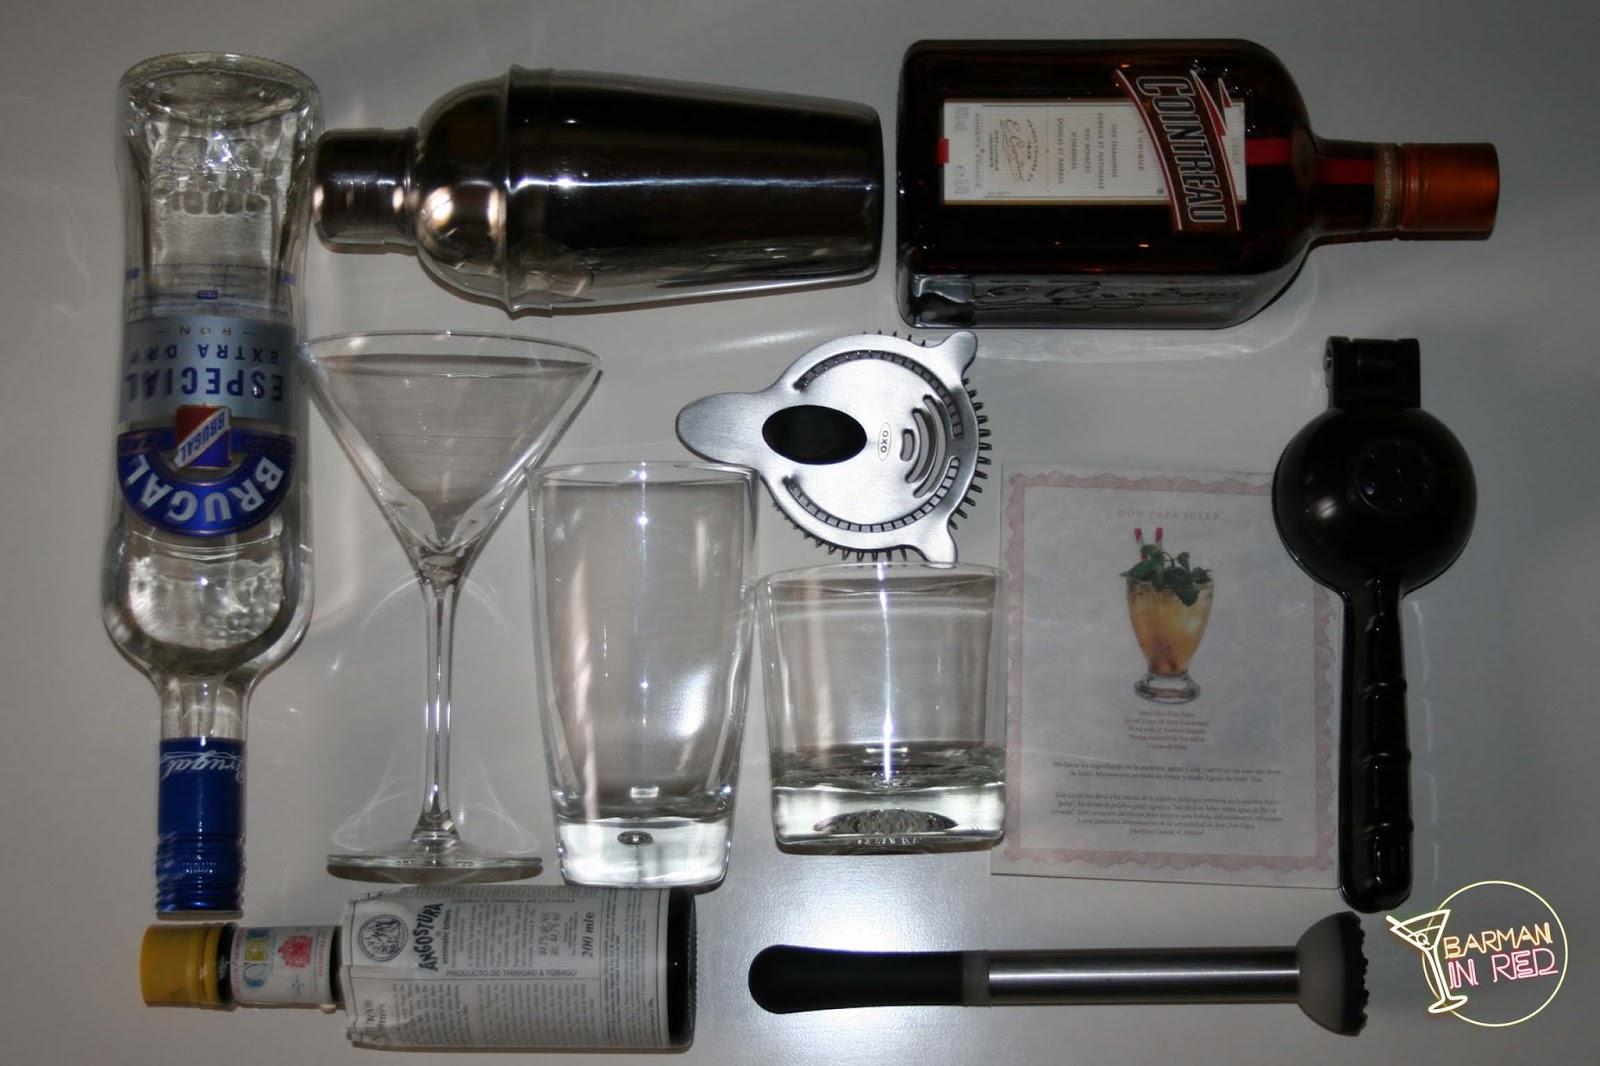 Qué necesitas para empezar a preparar cócteles en casa?